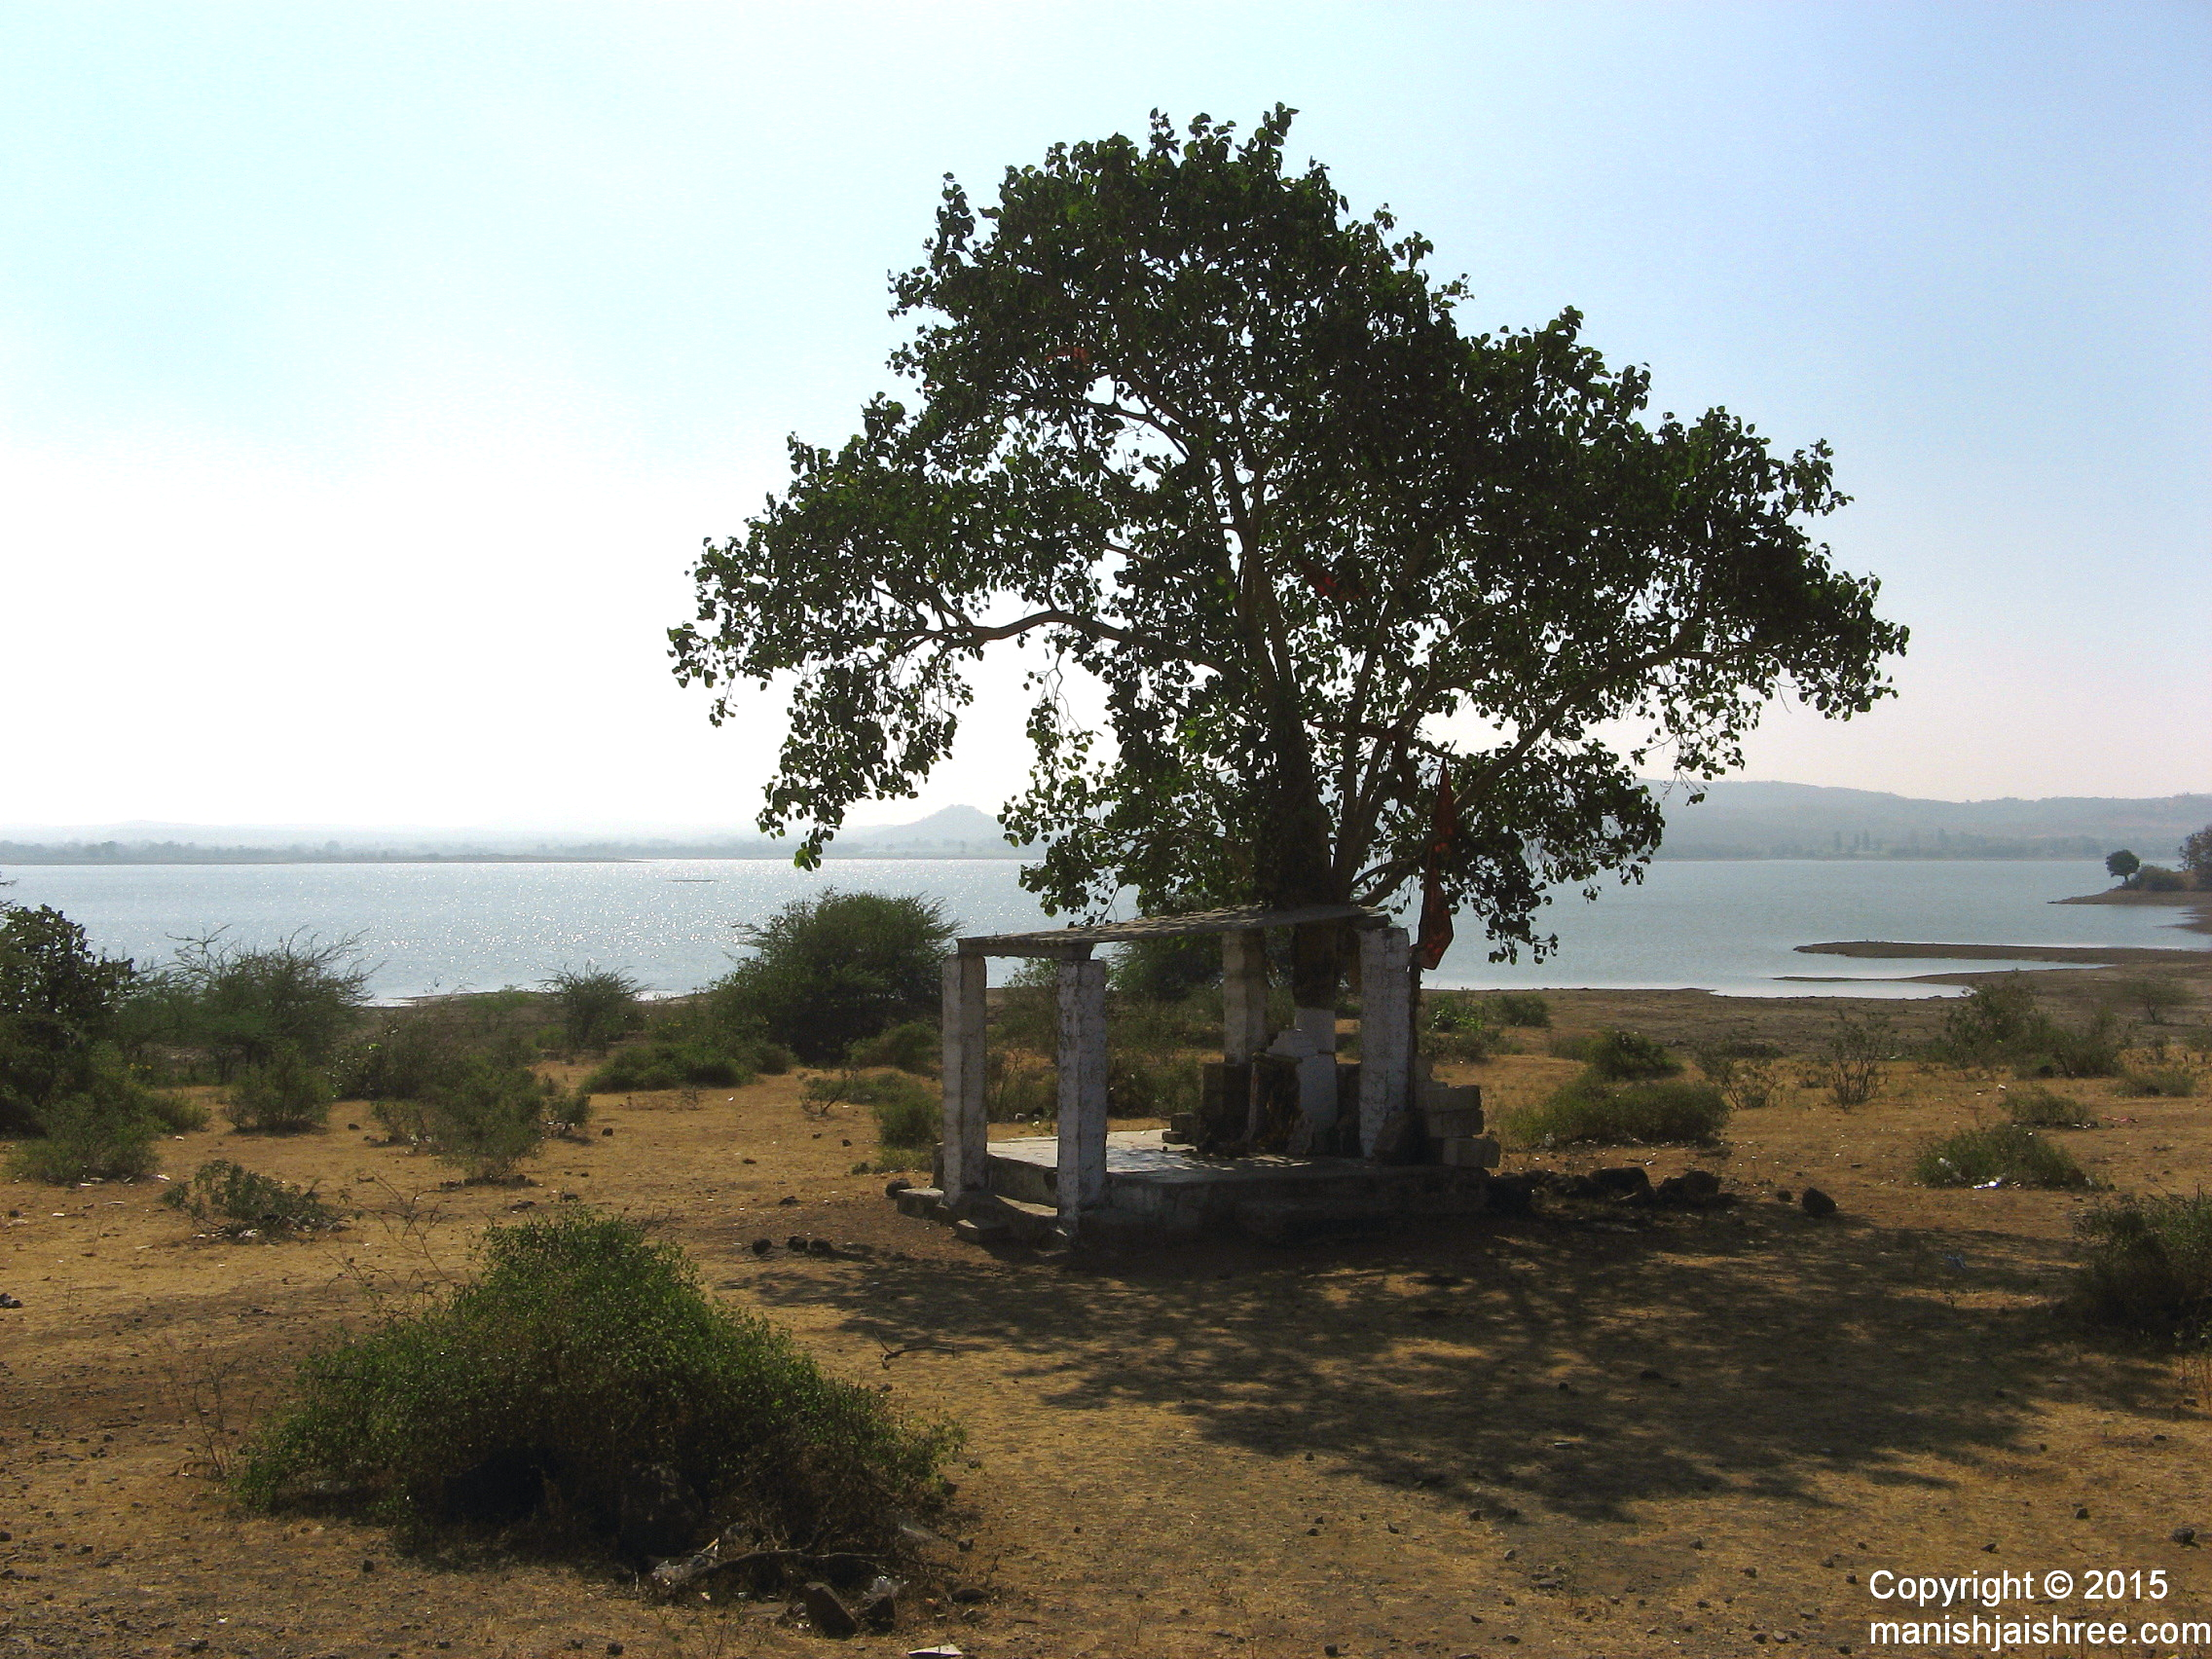 A peaceful place enroute, from Sasan-Gir to Junagarh